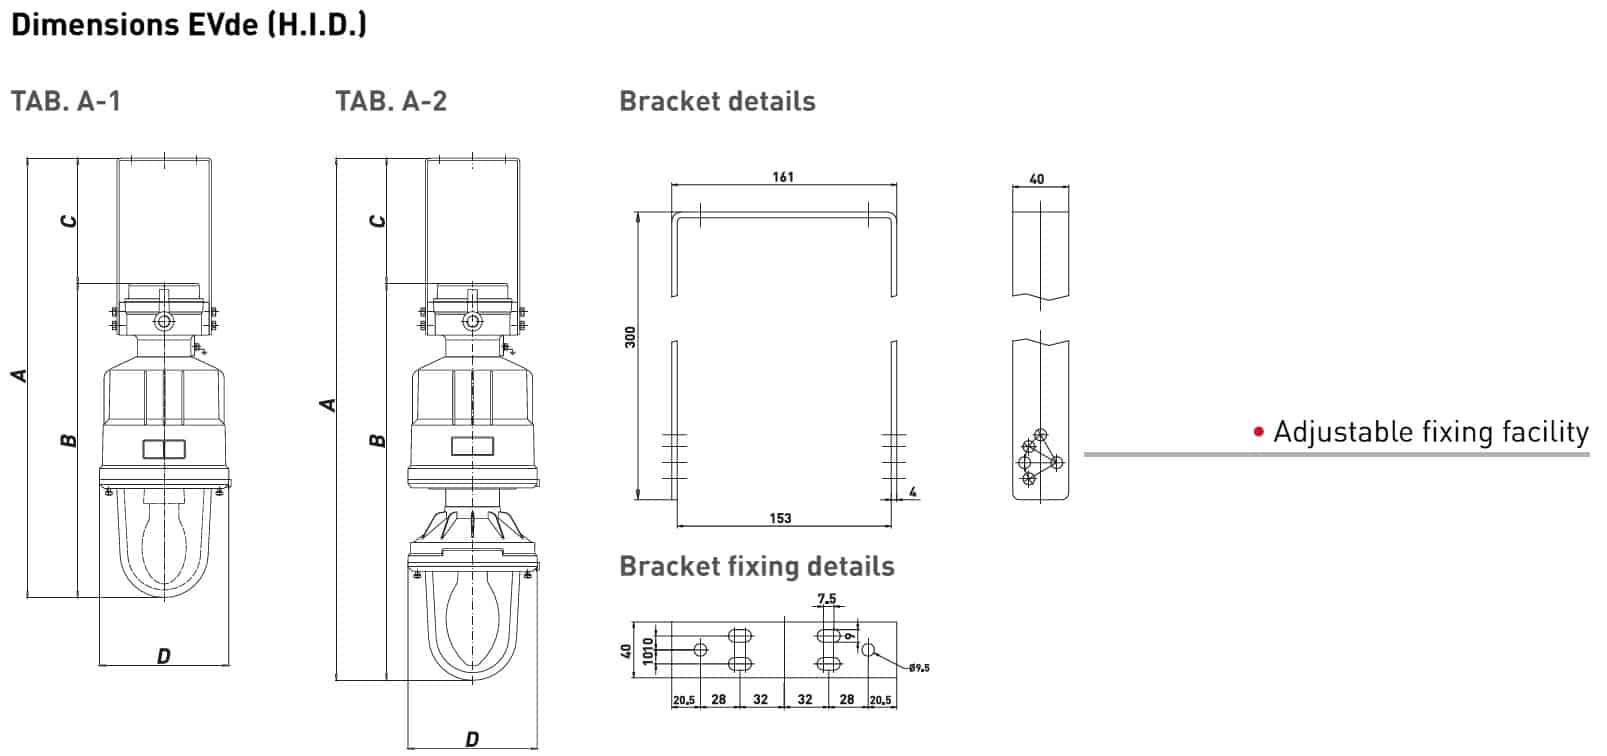 Explosion Proof Hazardous Area Technor EV HID Wellglass Lighting - EVde Dimensions